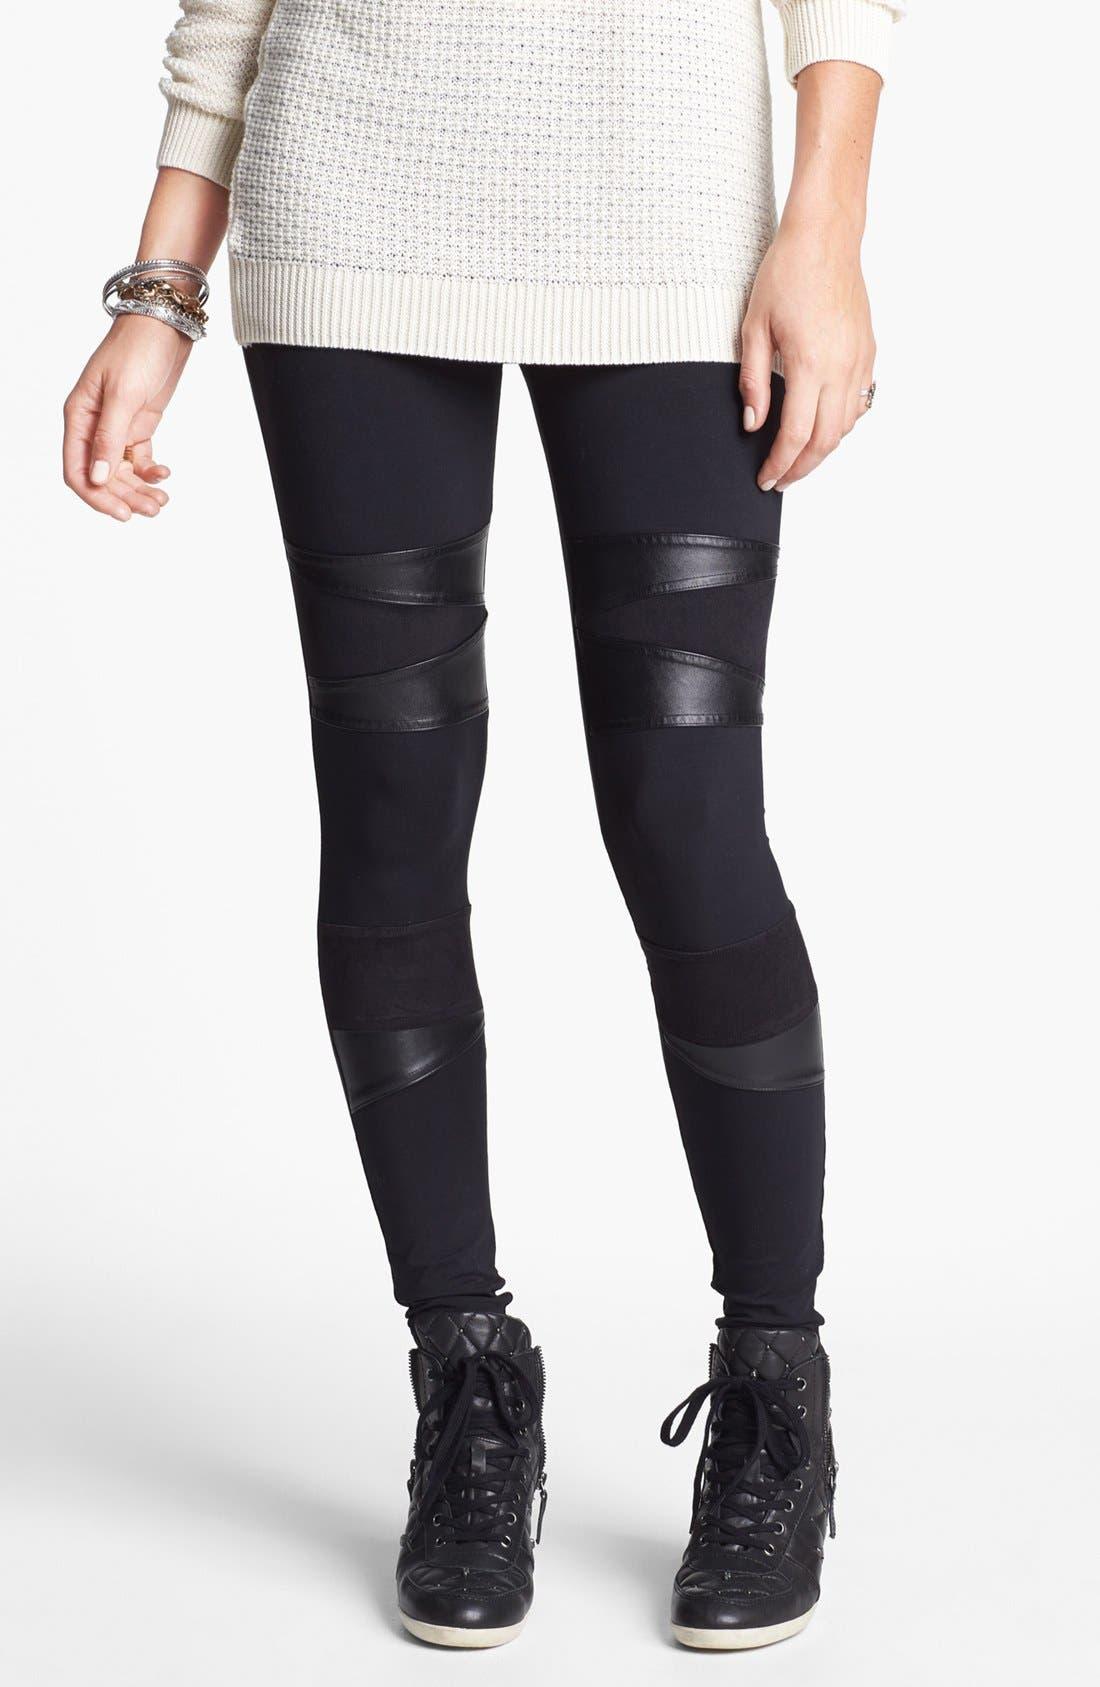 Alternate Image 1 Selected - Rubbish® Faux Leather Inset Leggings (Juniors)